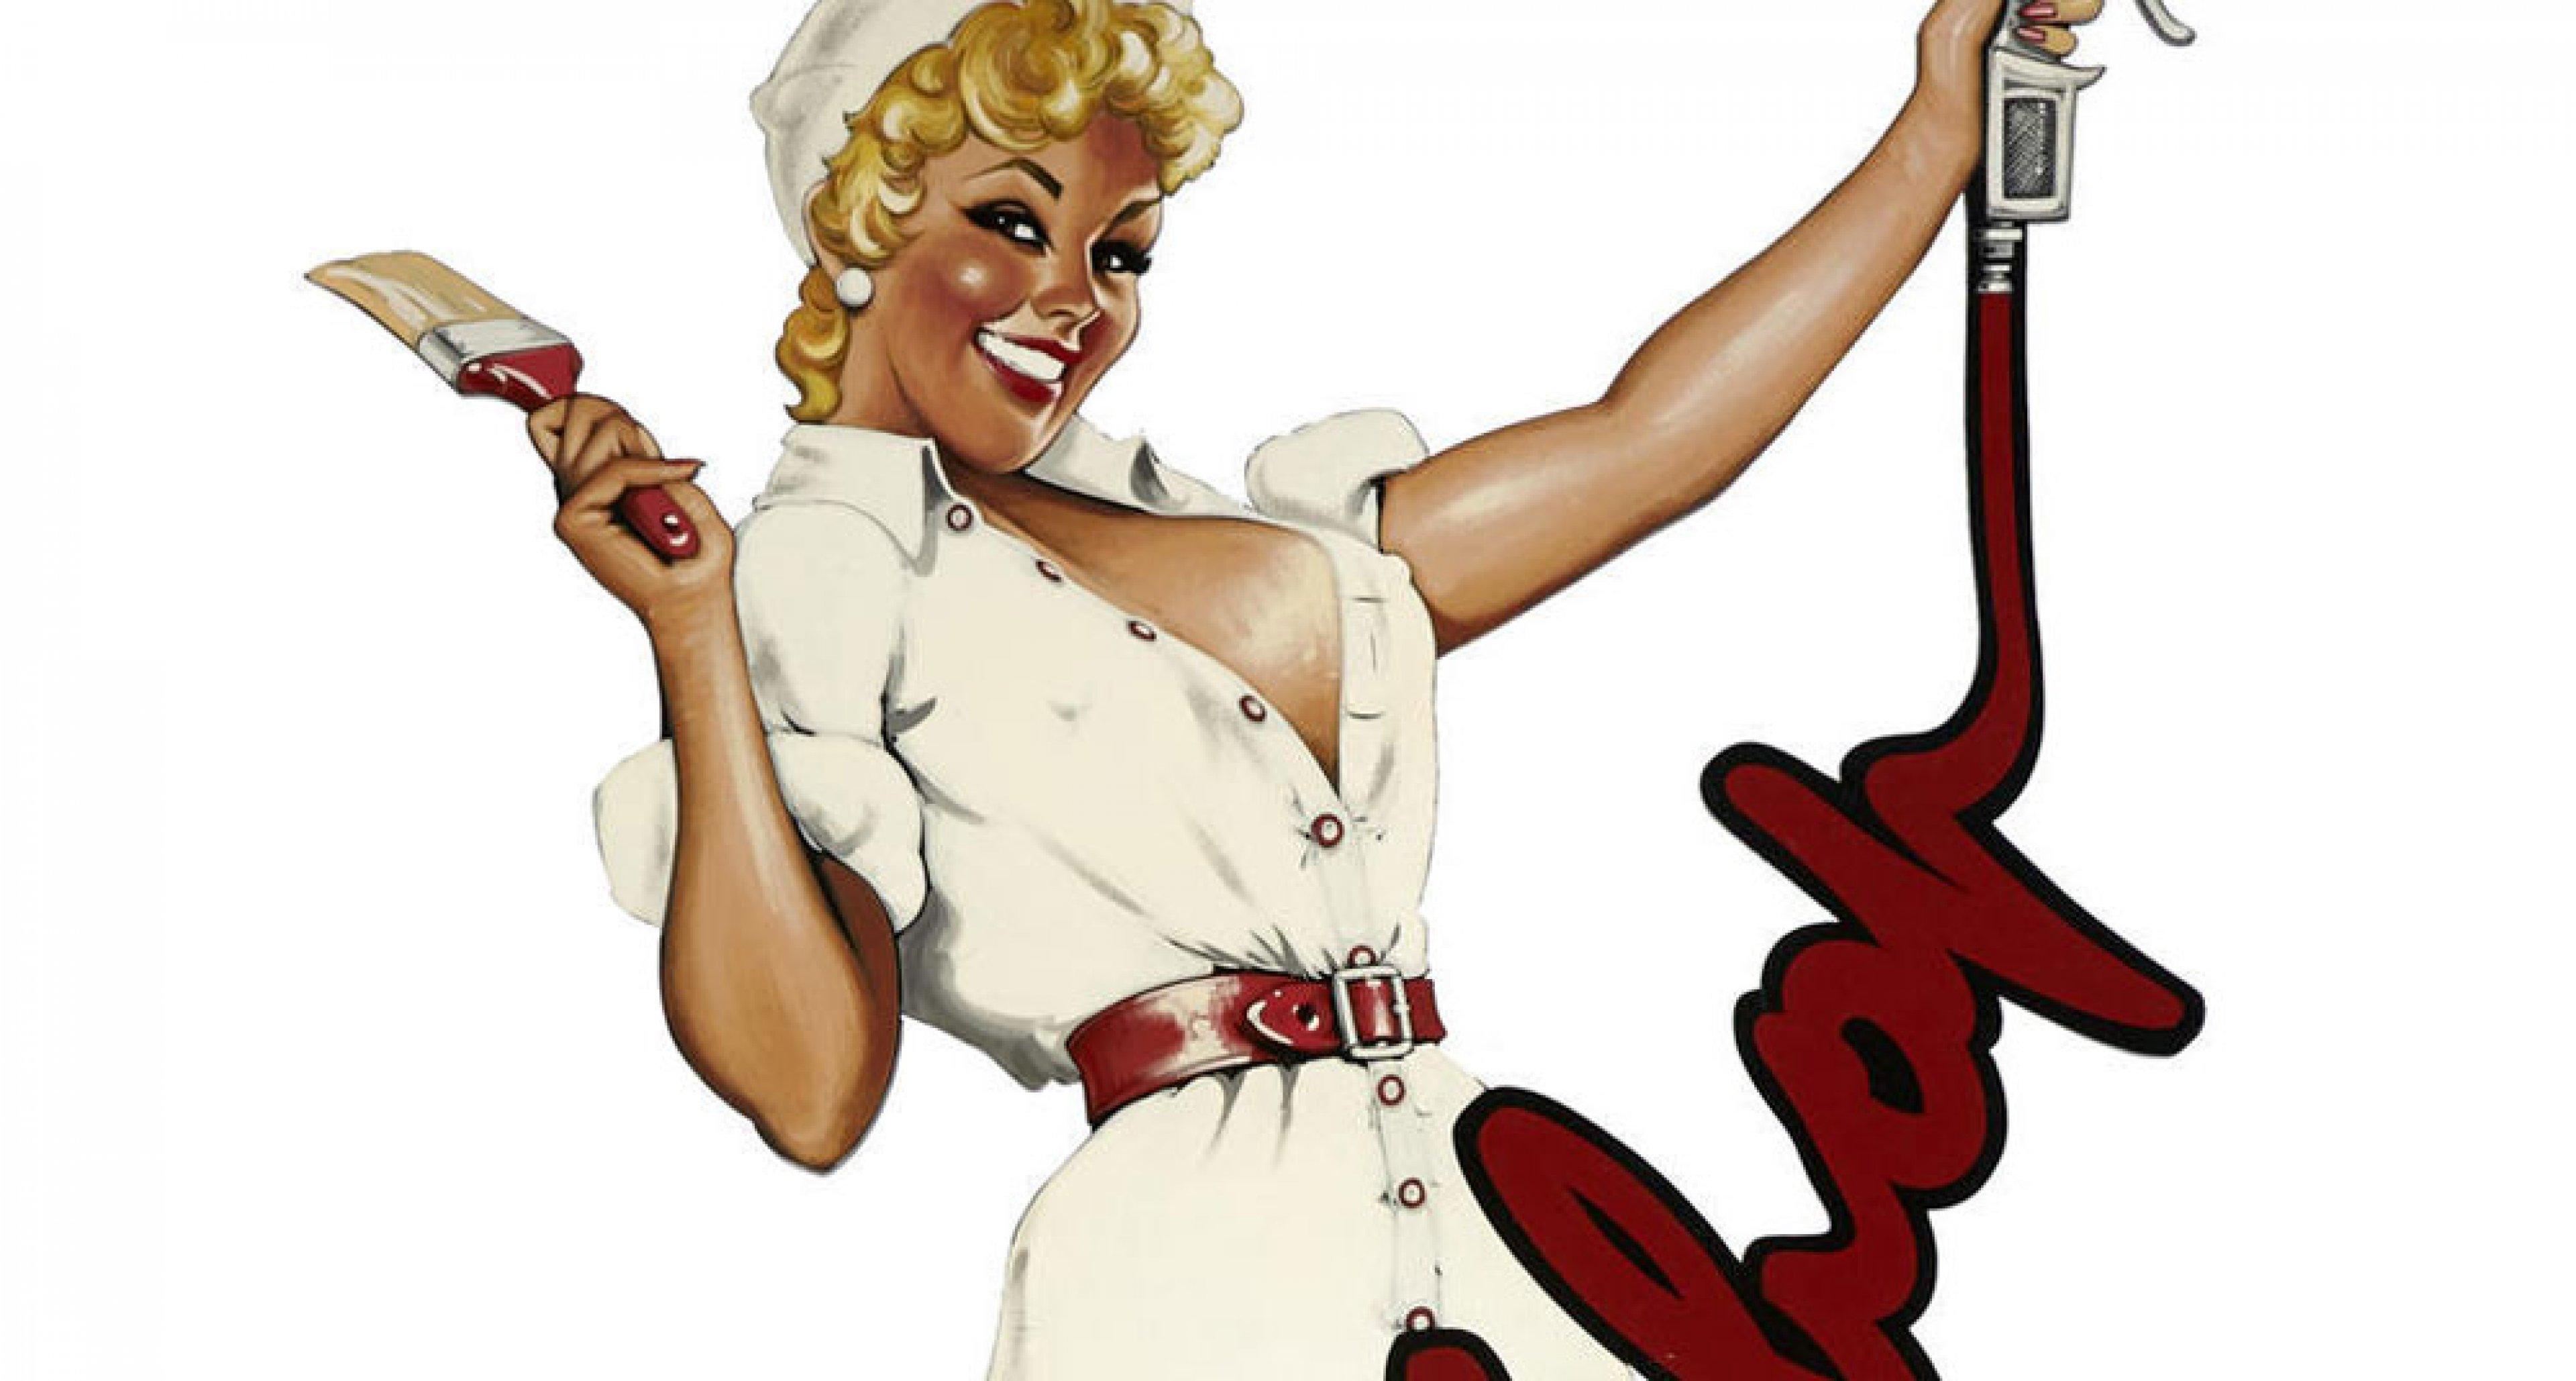 Tony Upson: Paint Shop Girl is for sale at the Bonhams Quail Lodge Auction